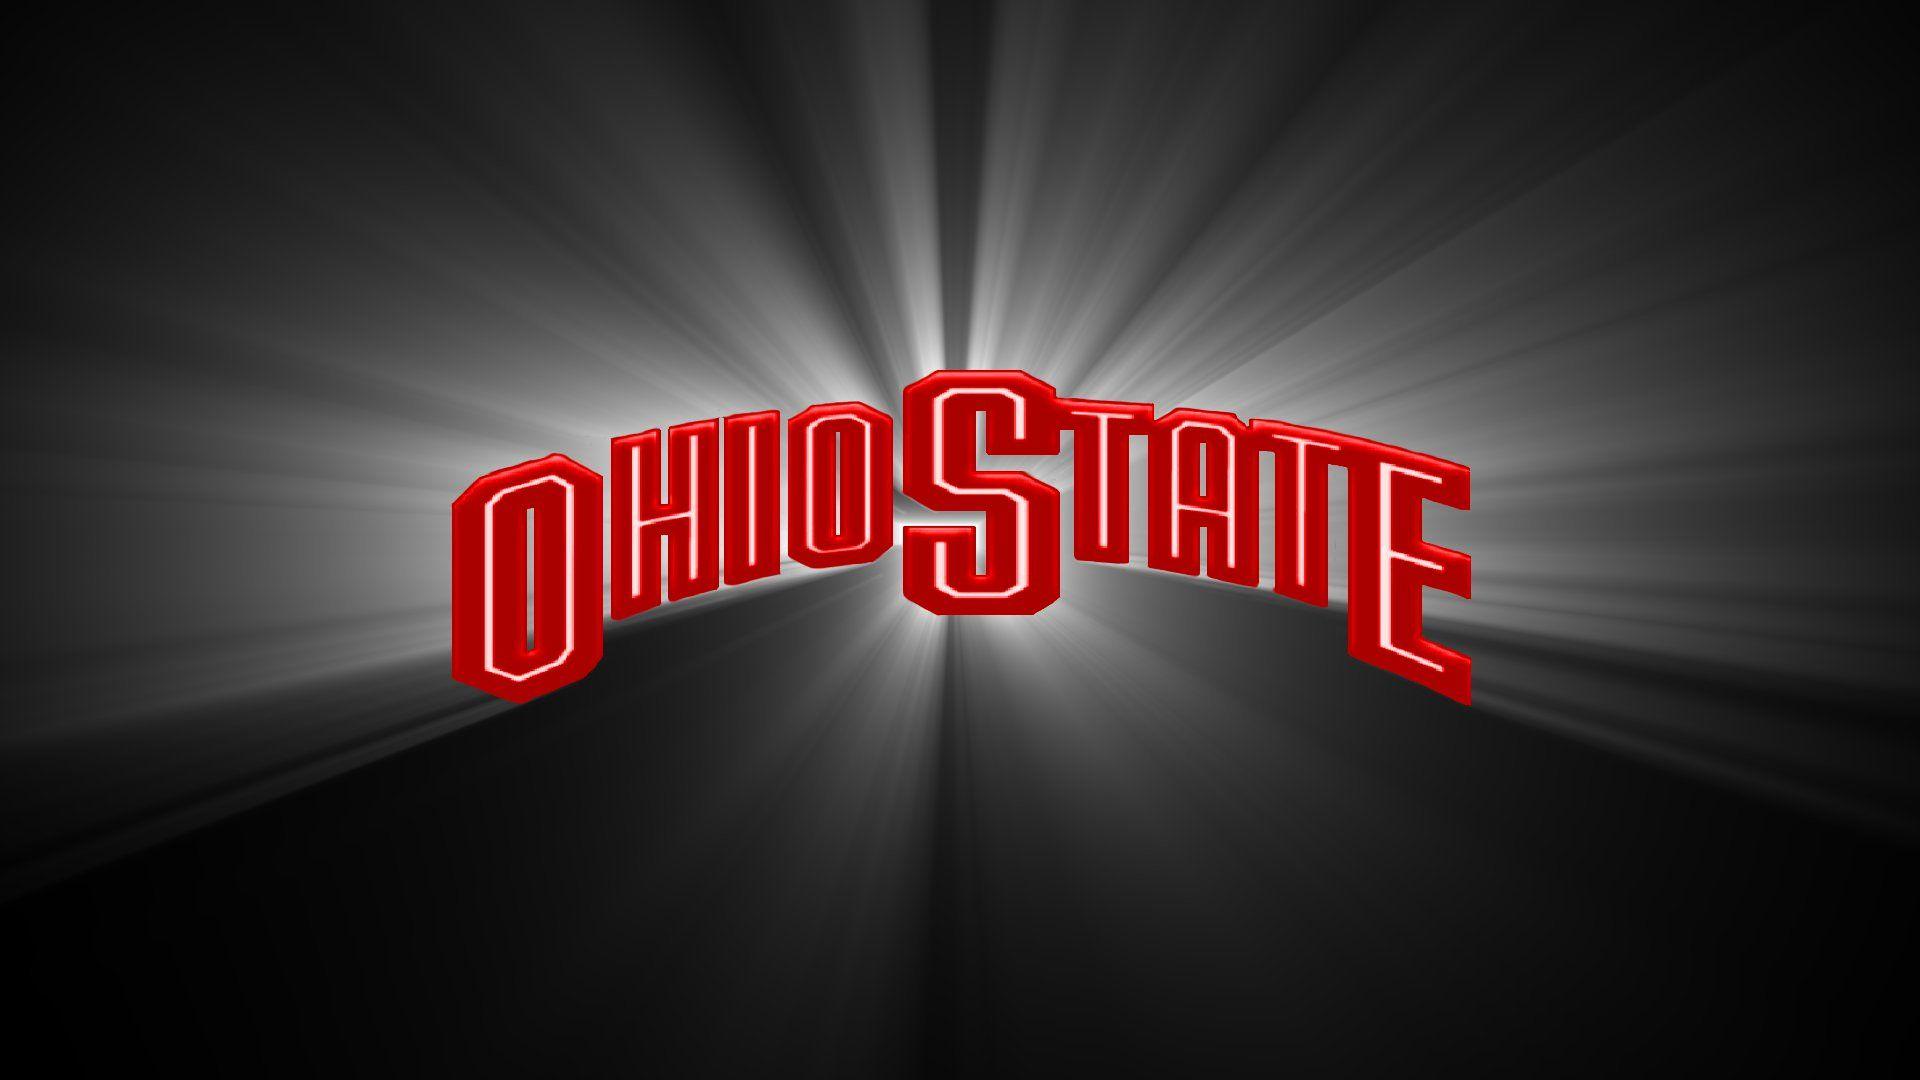 ohio state logo iphone wallpaper